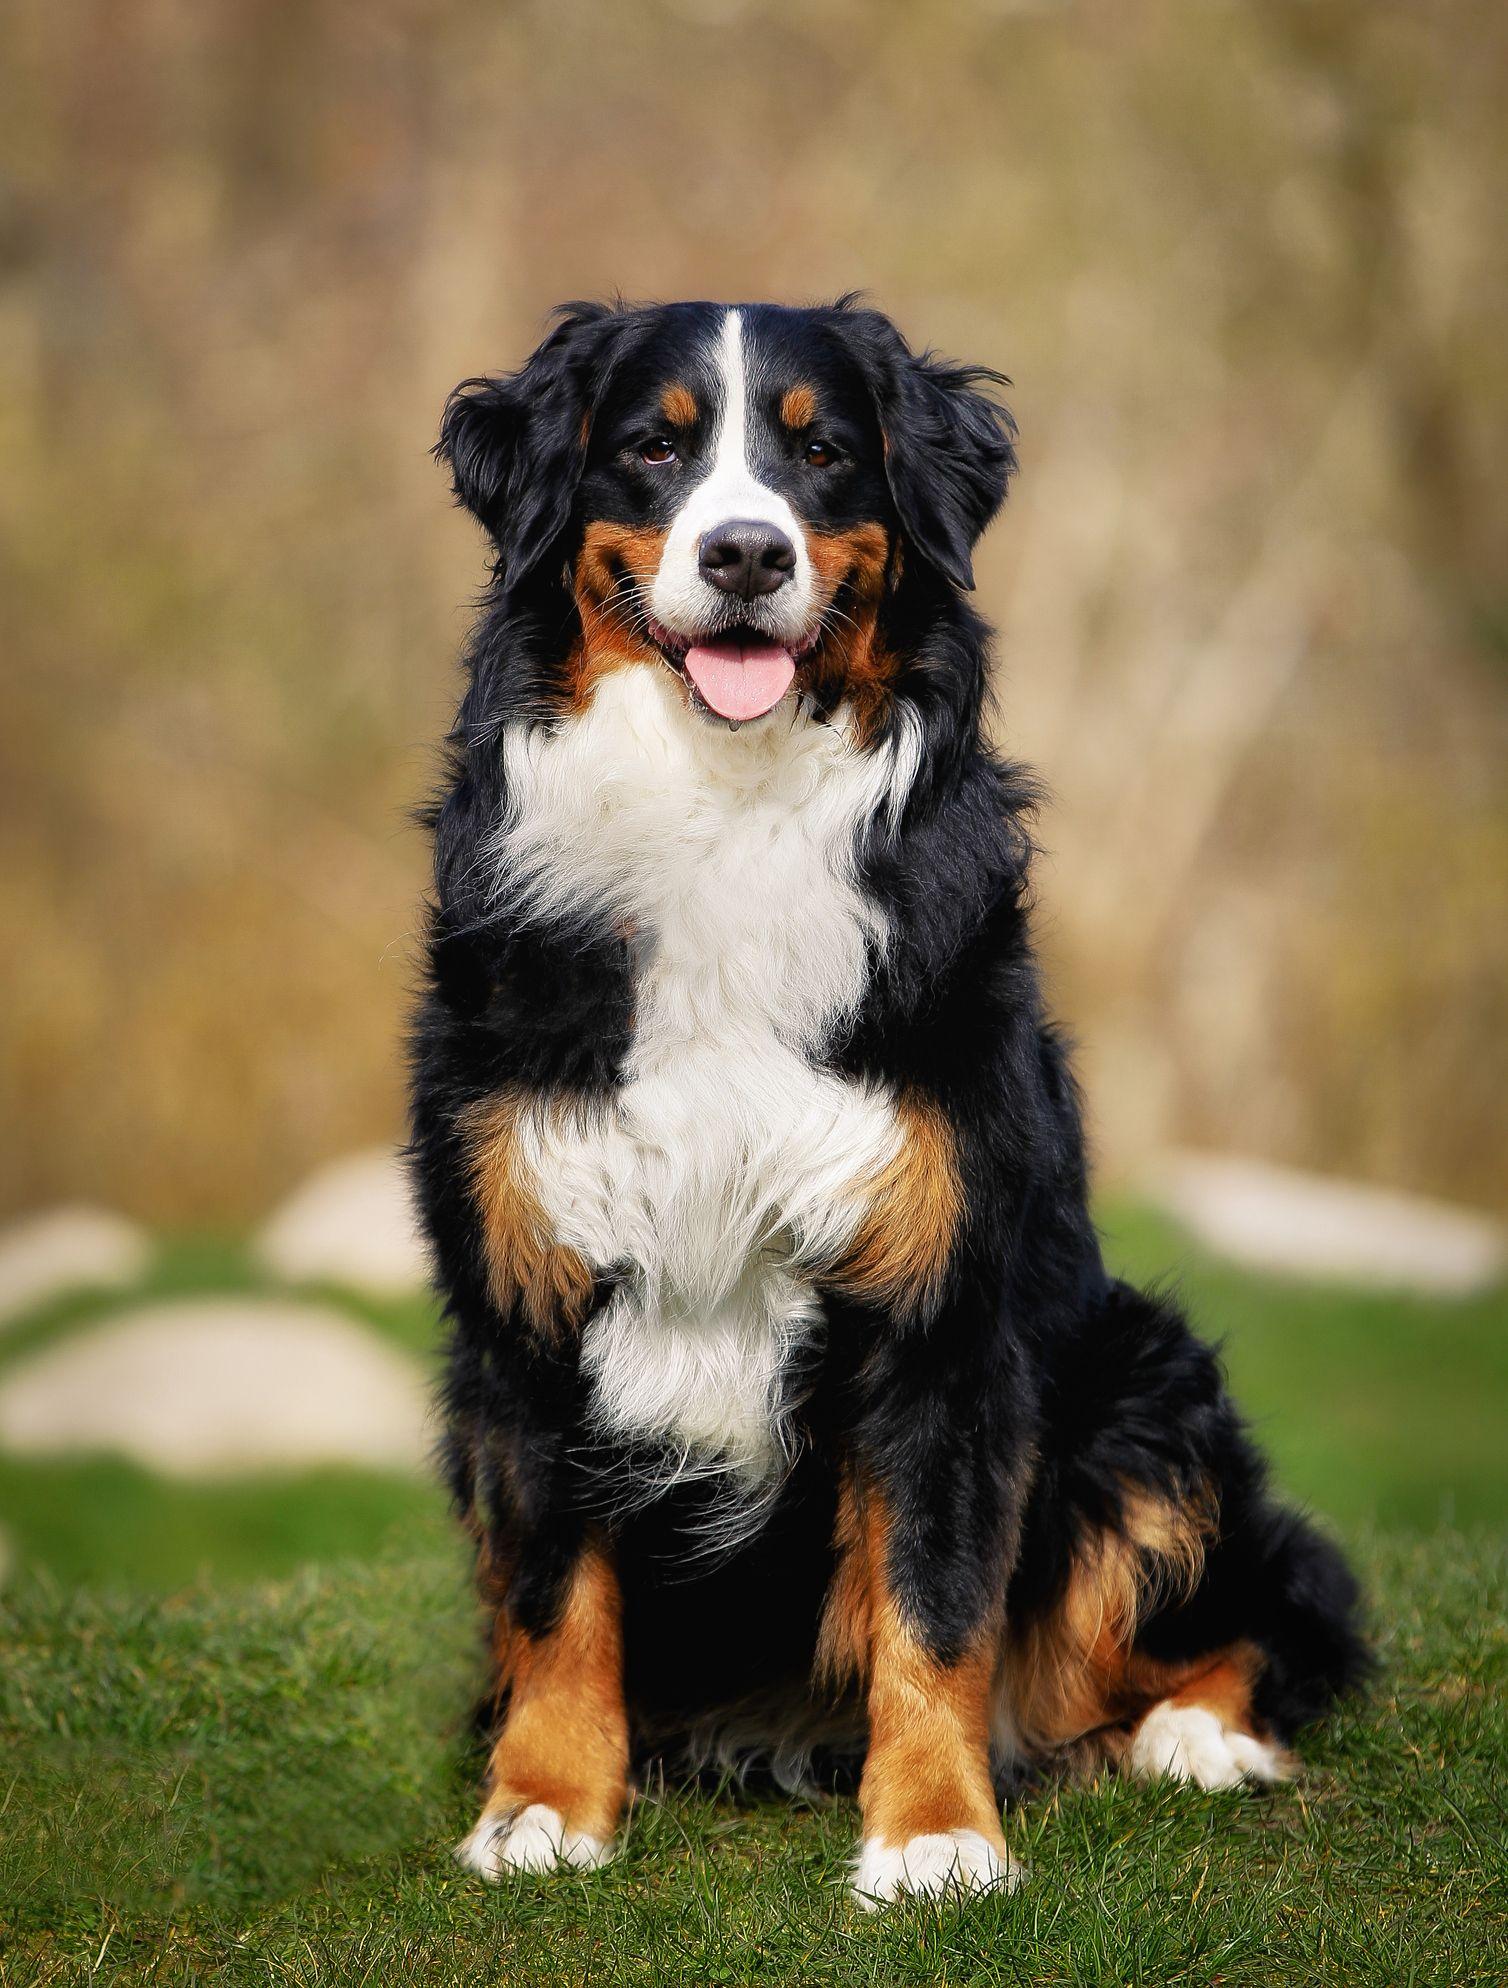 20 Best Dog Breeds For Kids Good Family Dogs